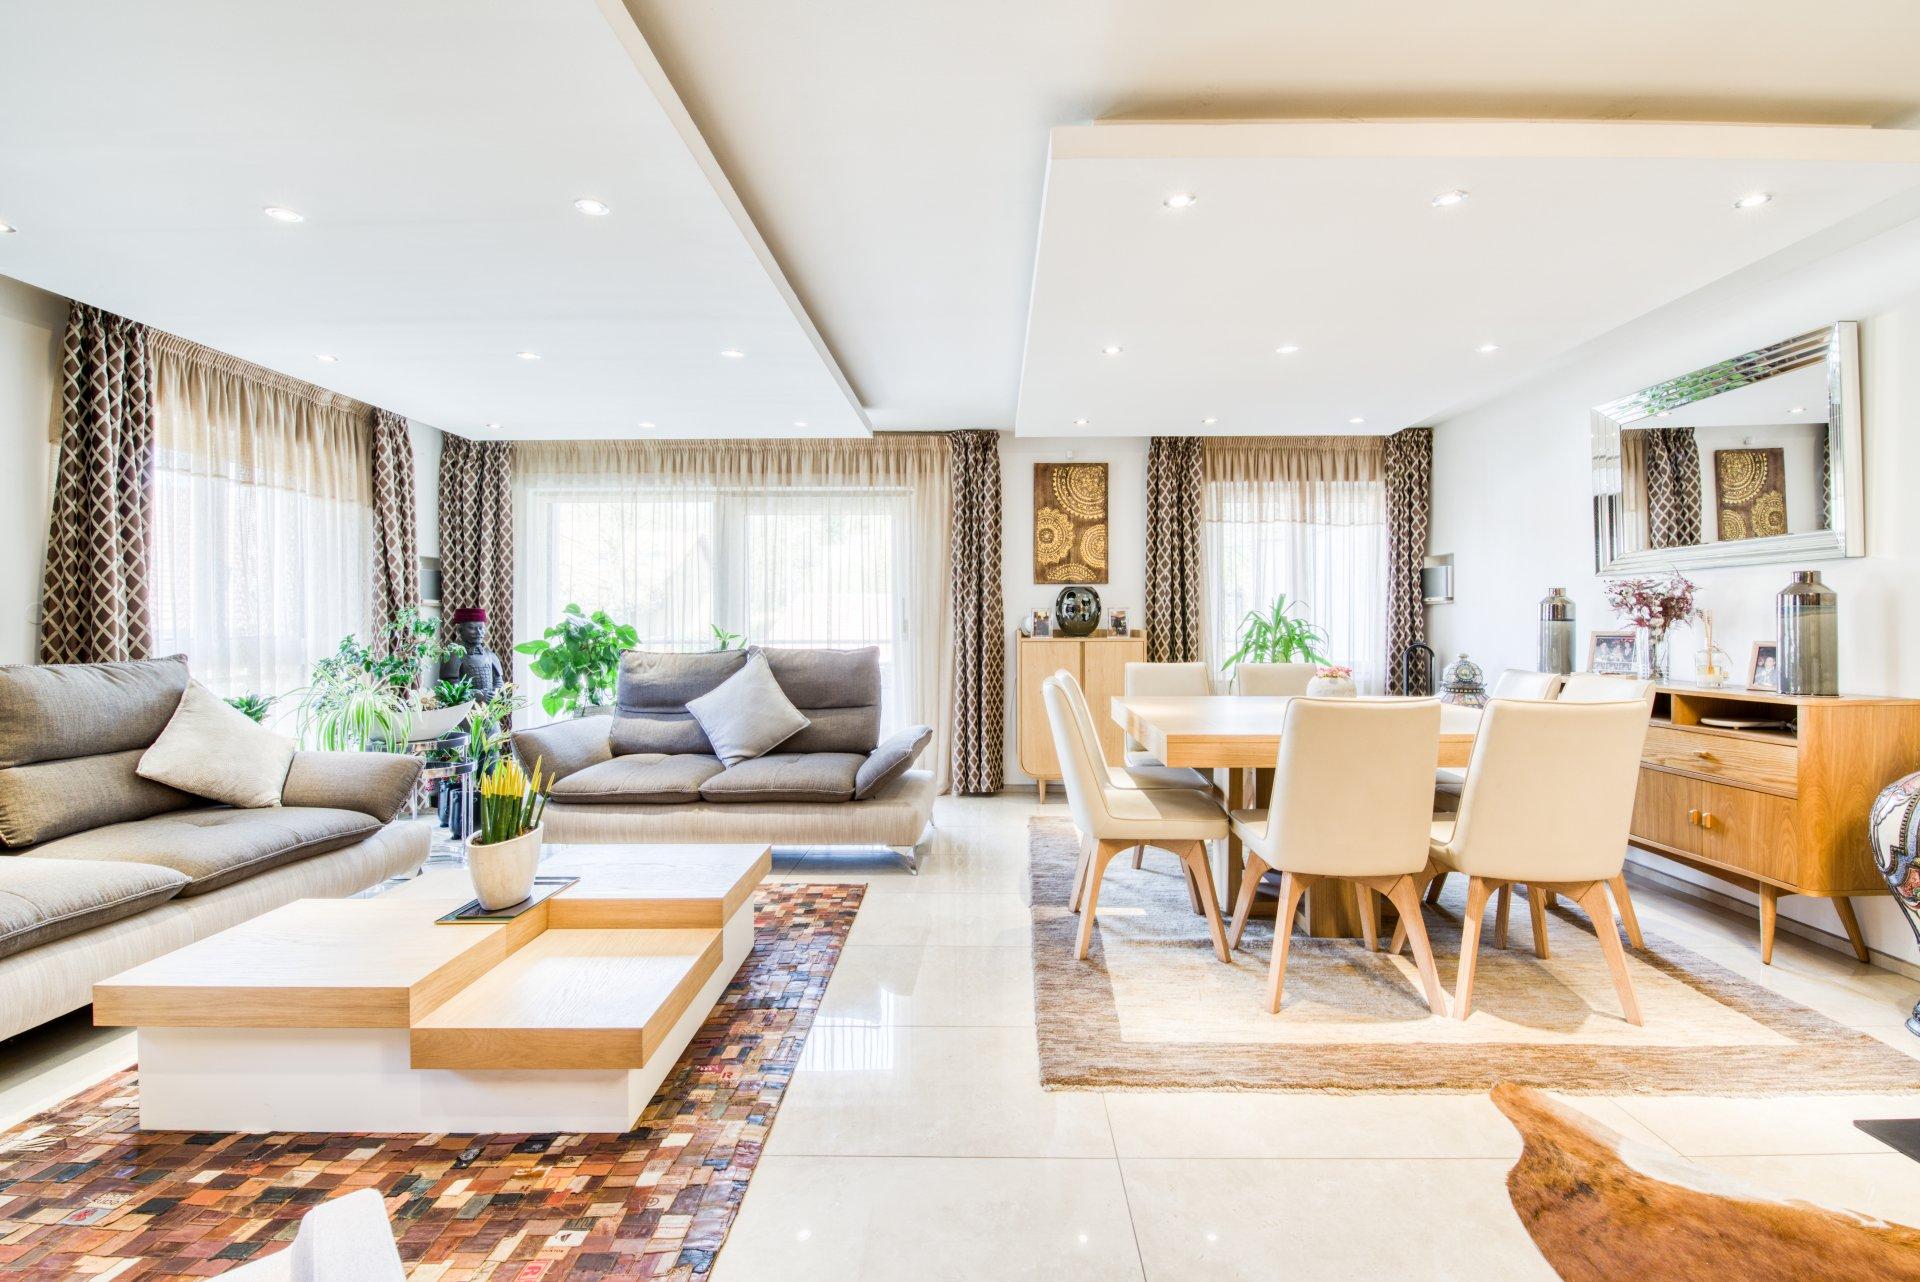 Sale Apartment - Moulins-lès-Metz